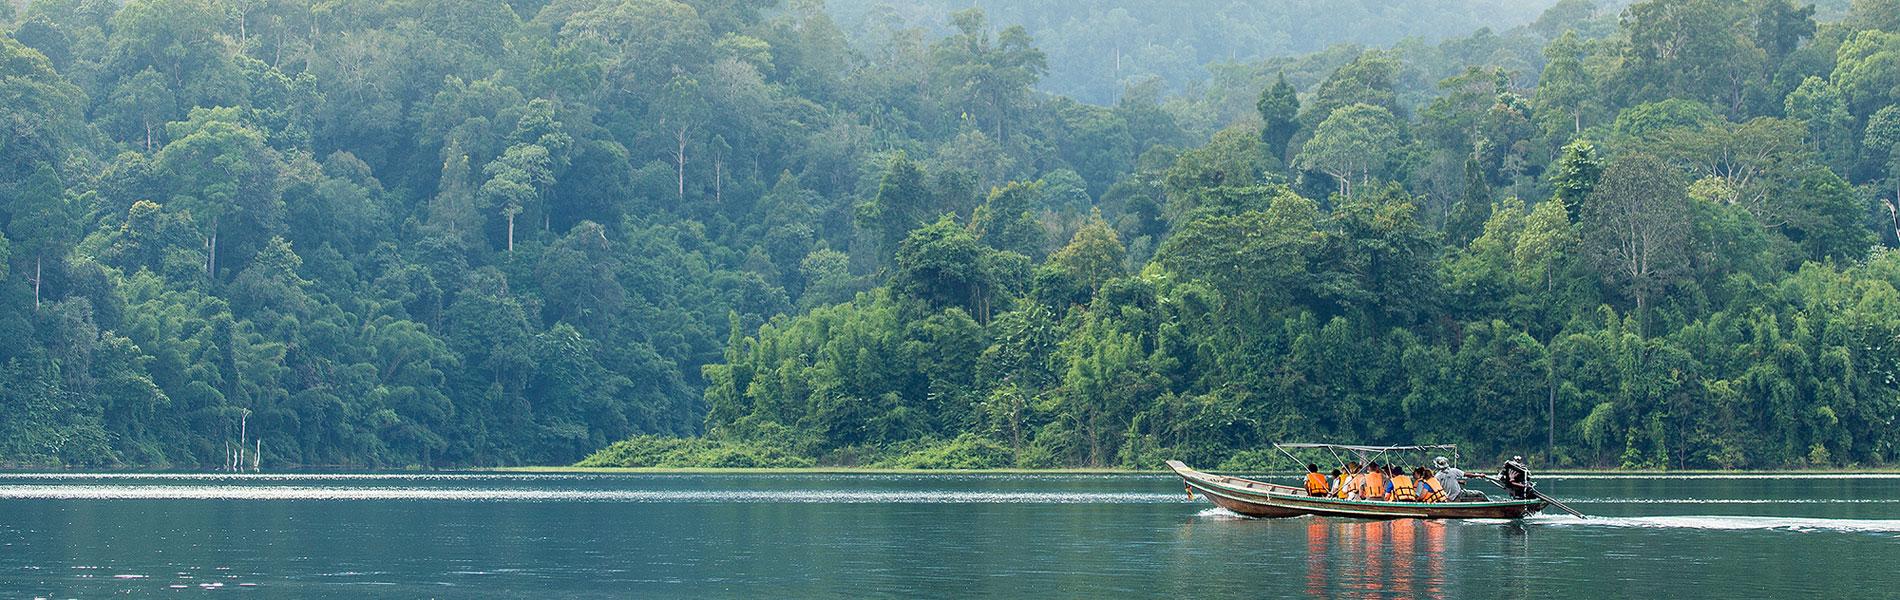 Rainforest Camp Atmosphere